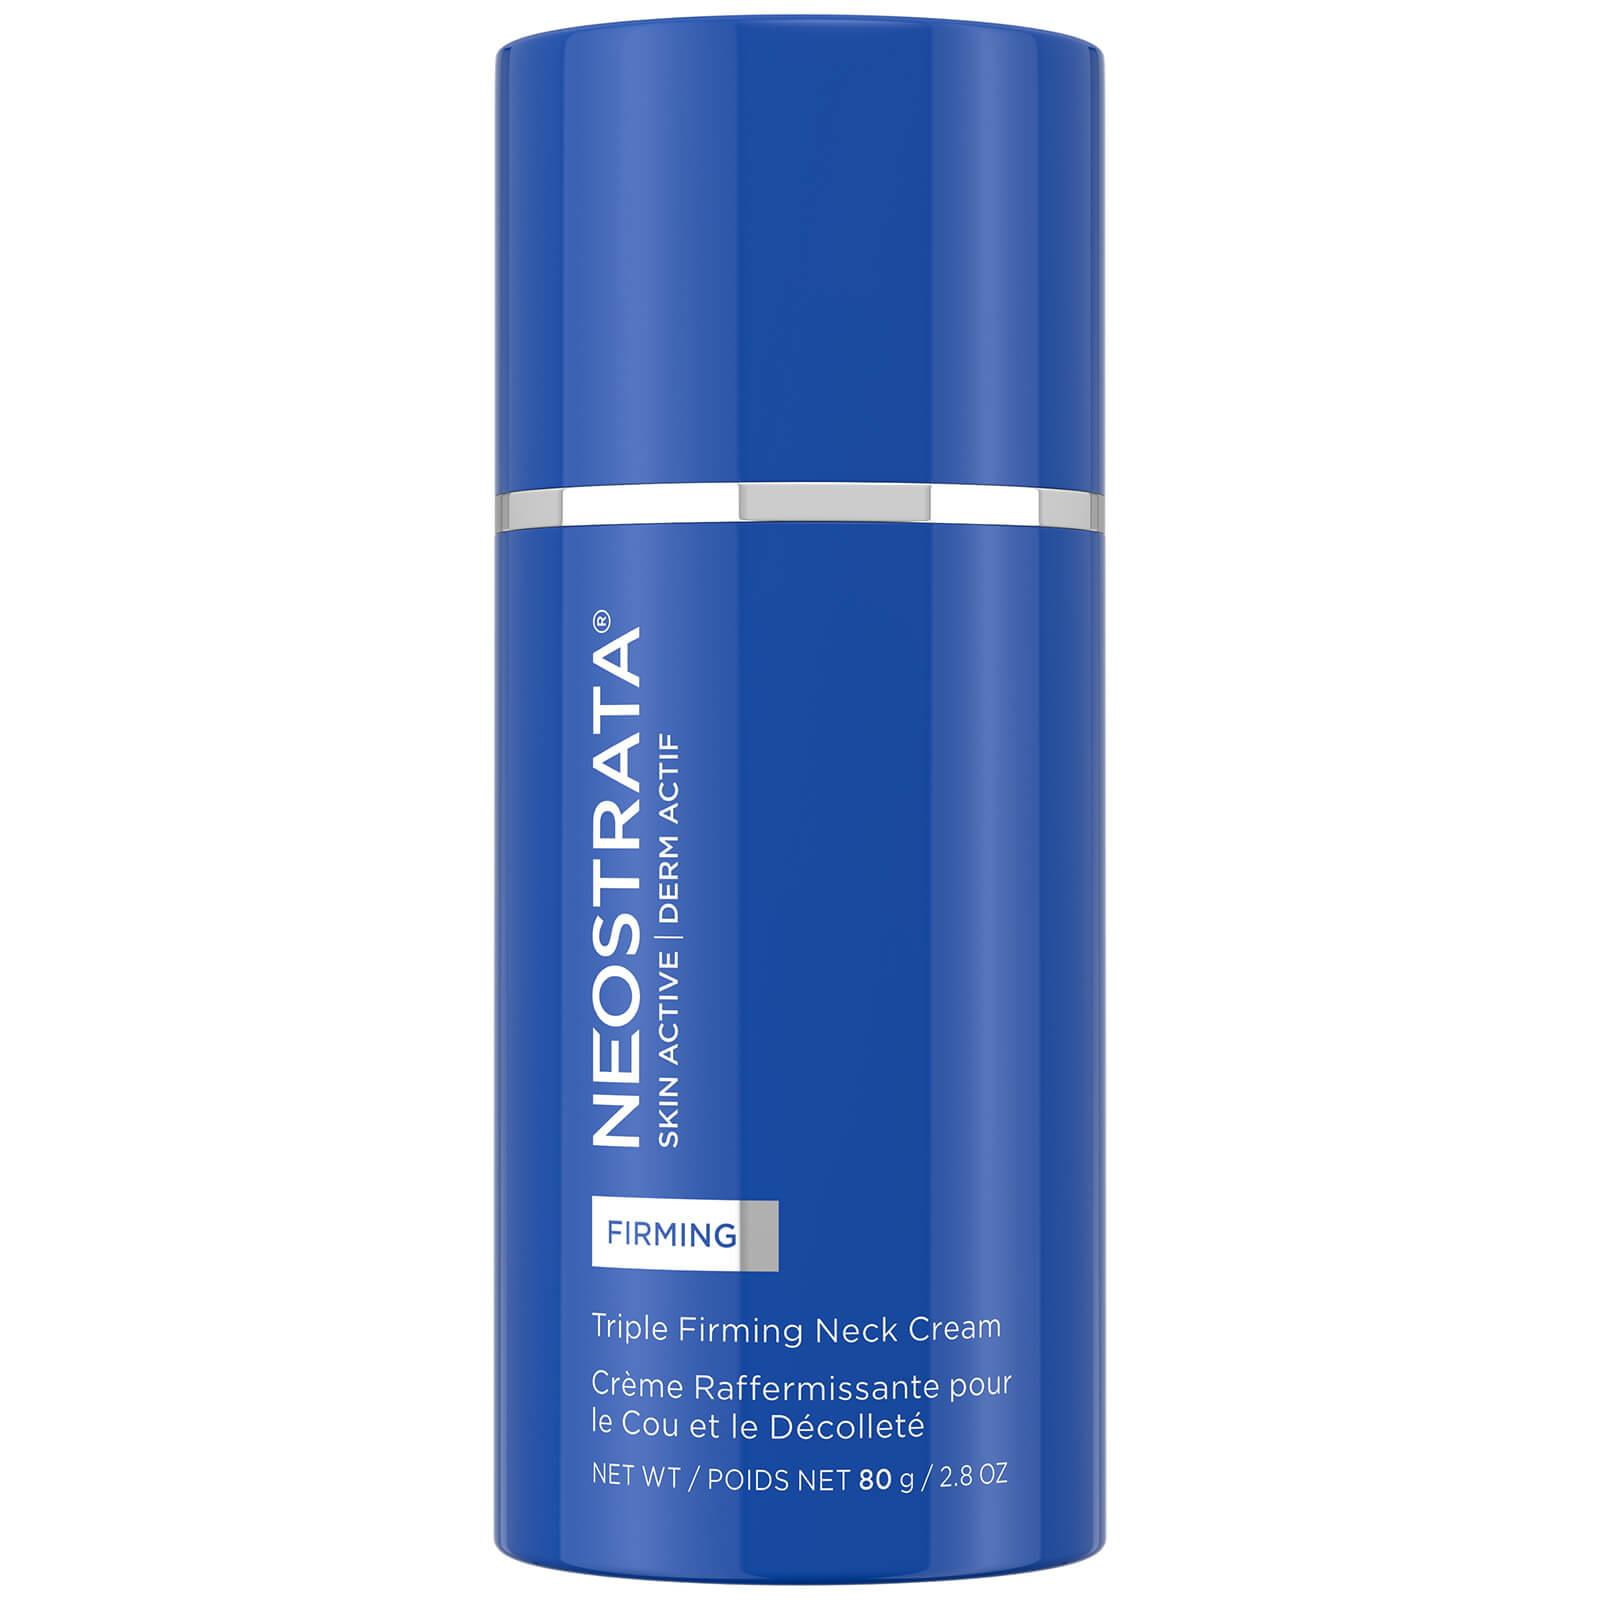 NEOSTRATA Skin Active Triple Firming Neck Cream 80g